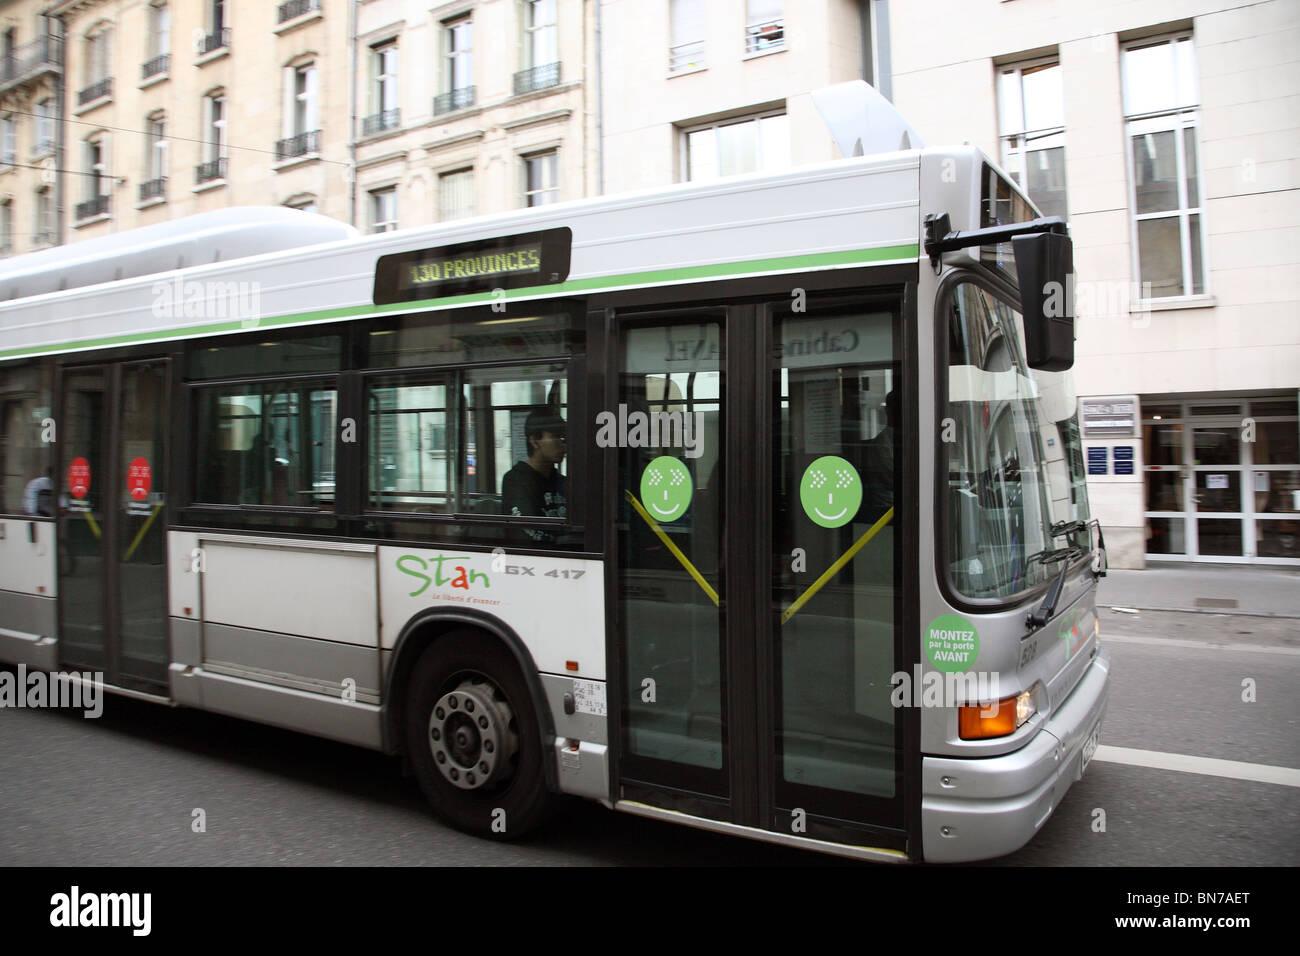 A bus number 130 Provinces, Nancy, France - Stock Image